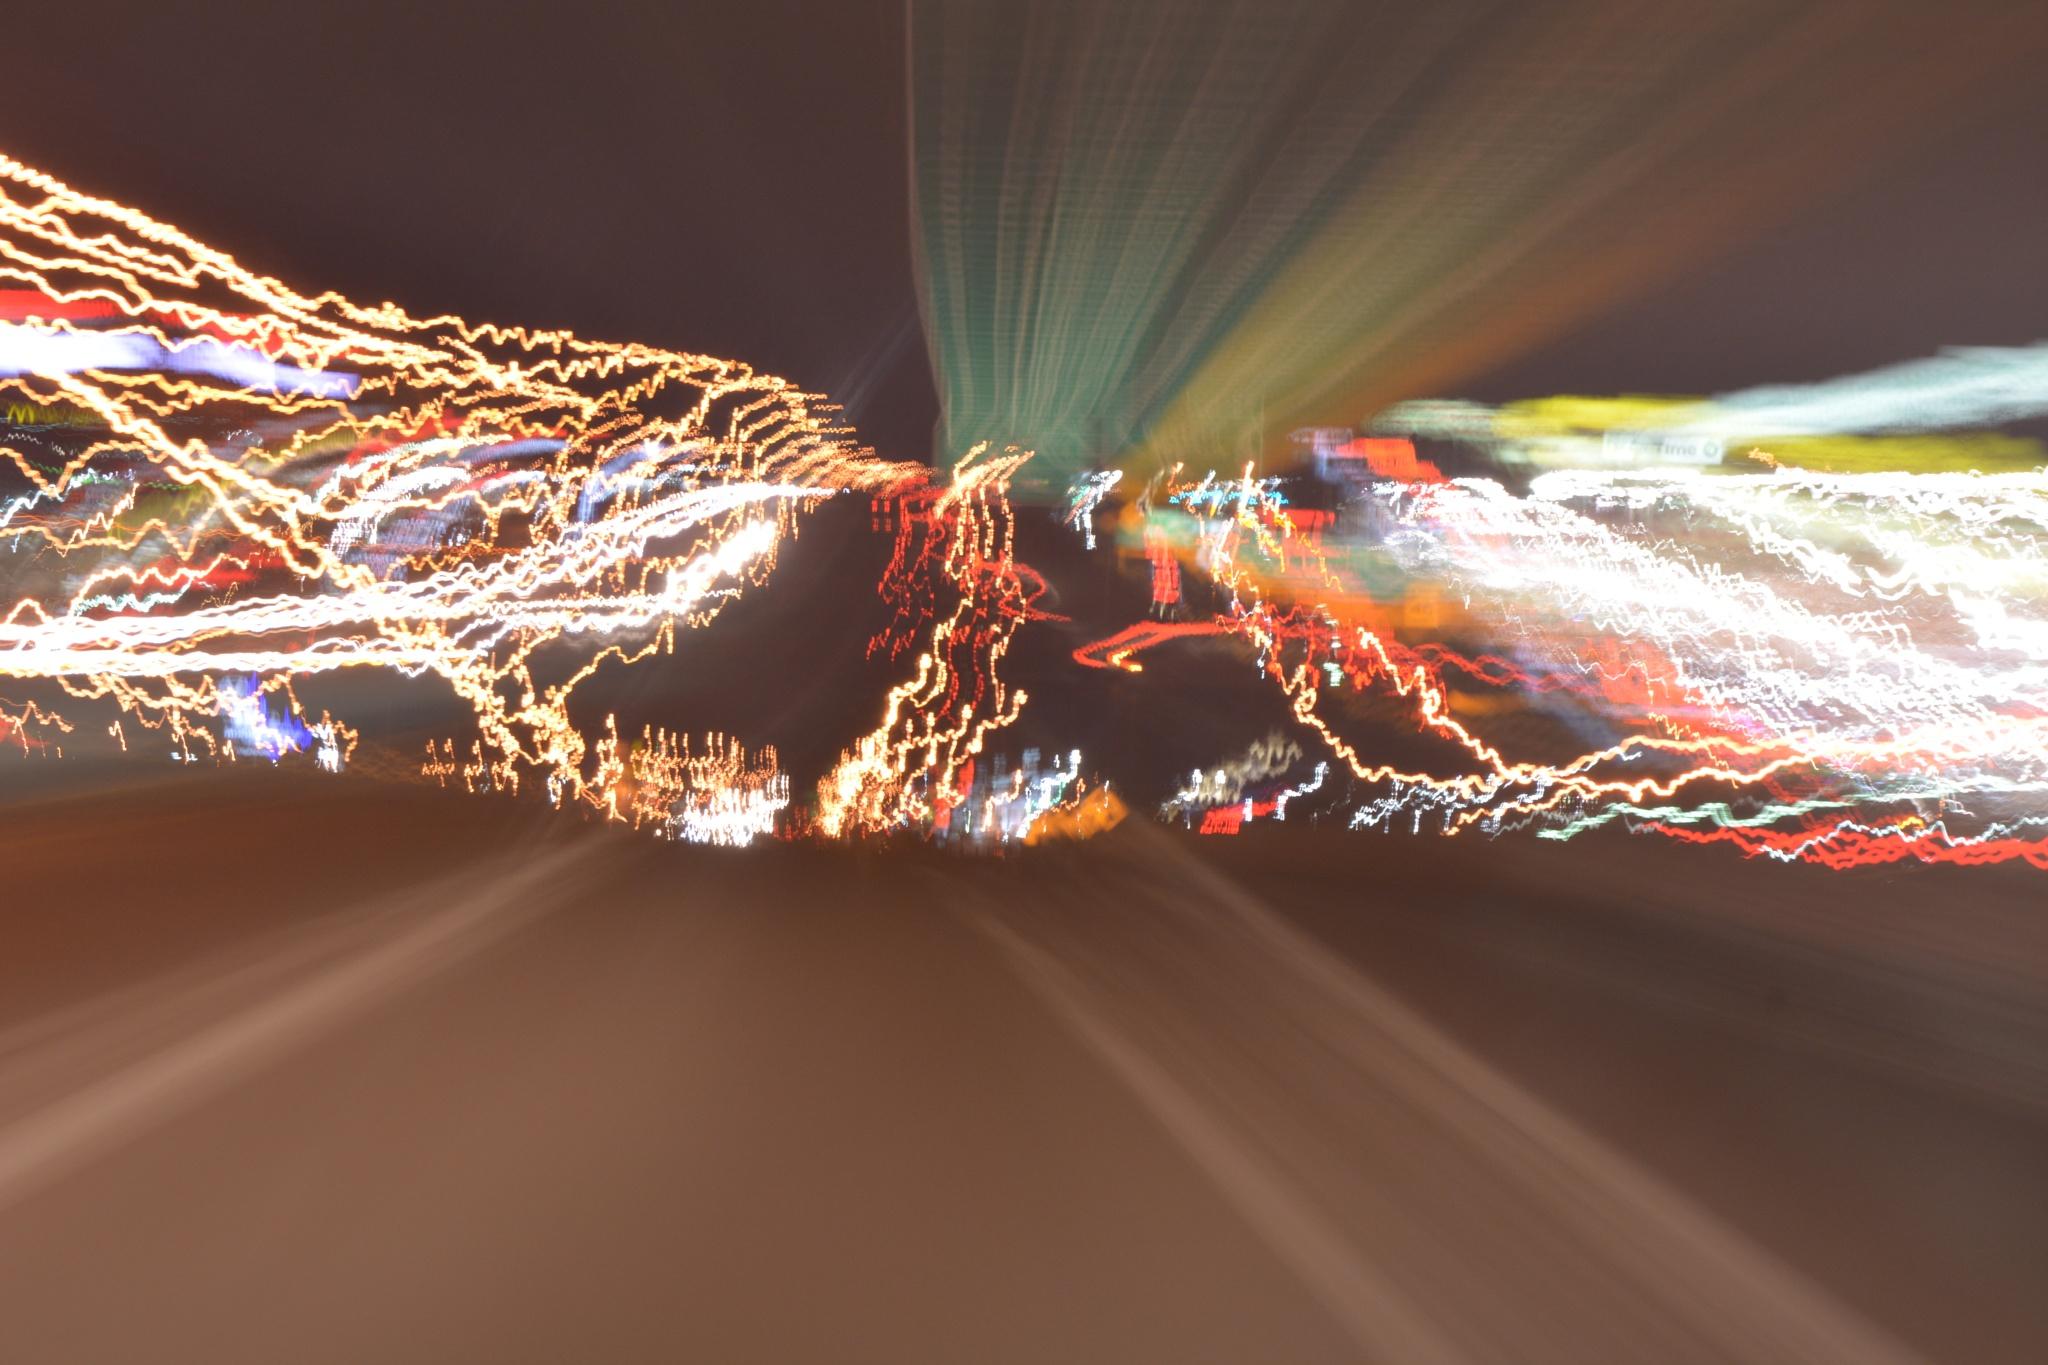 warp drive by roughneck1-9